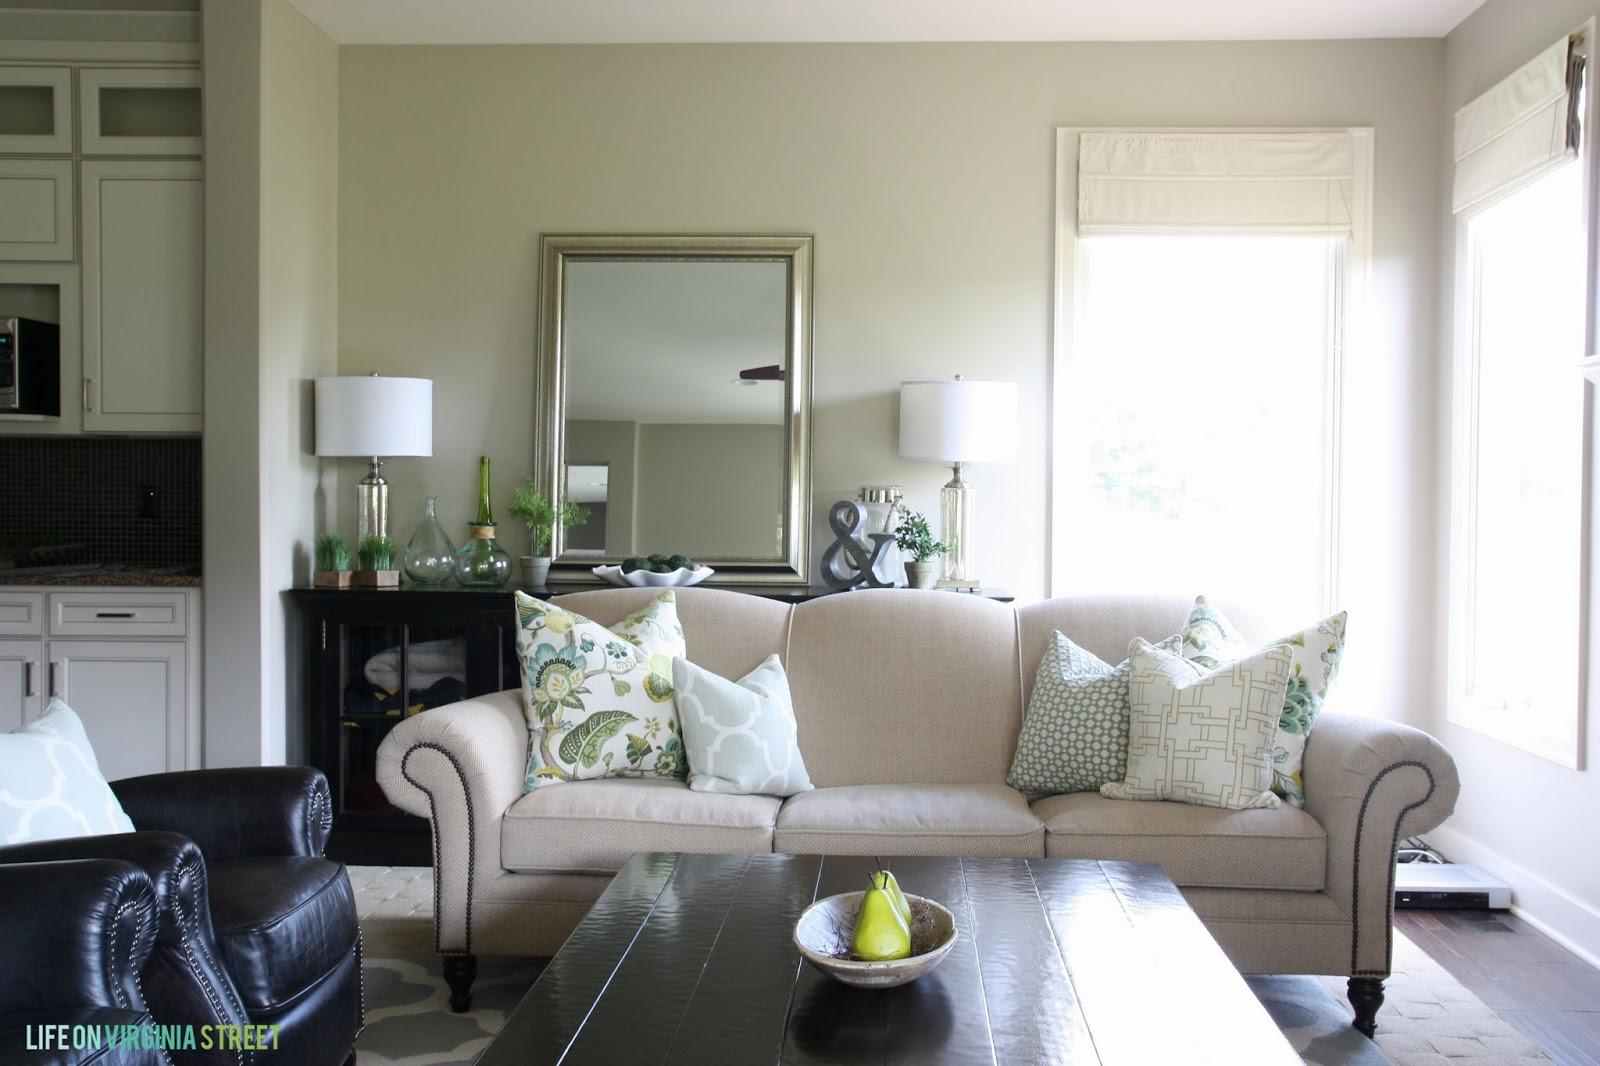 Living Room Decor Life On Virginia Street